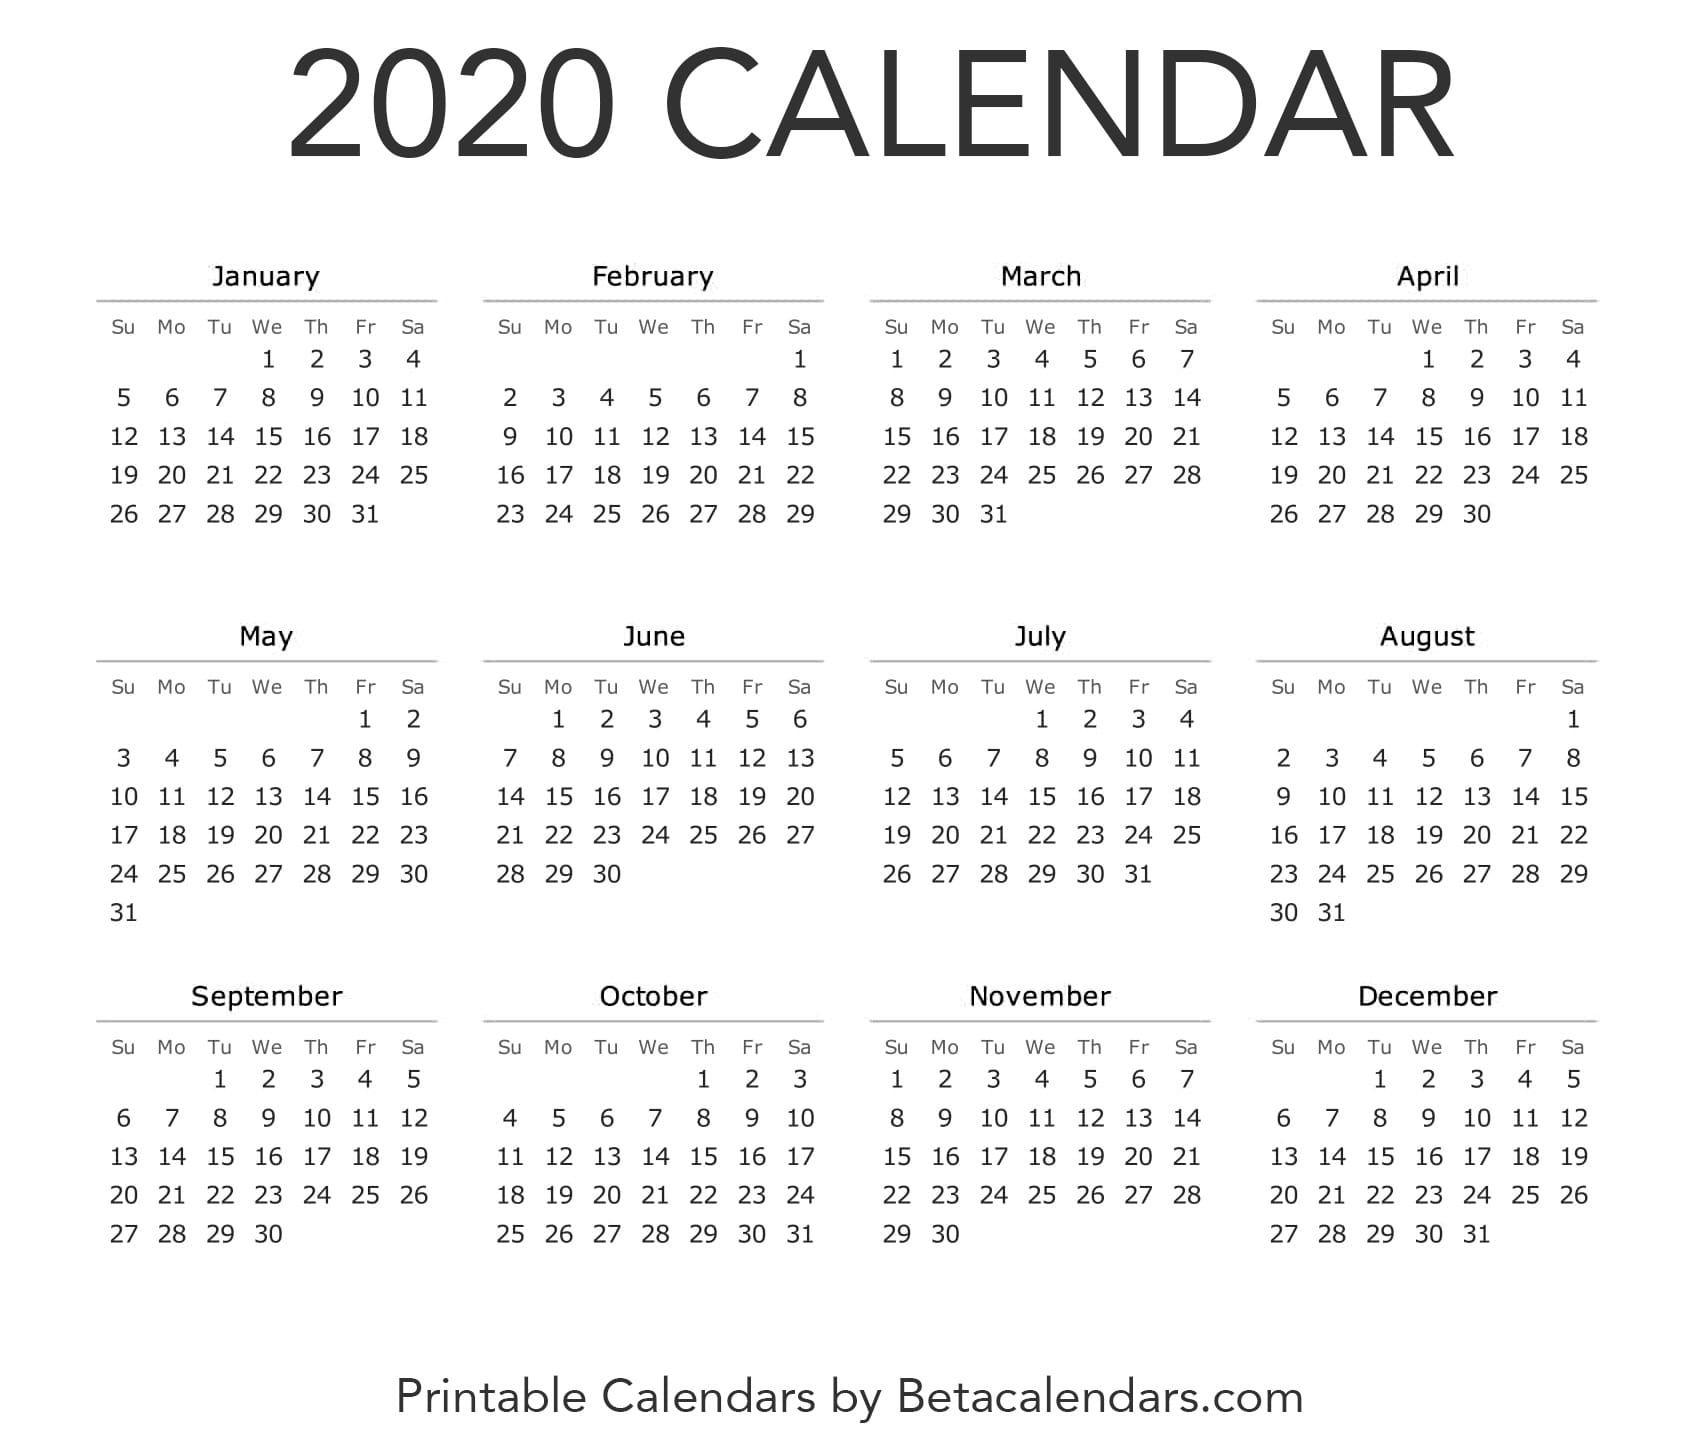 Calendar 2020 | Printable Yearly Calendar, Calendar 2020